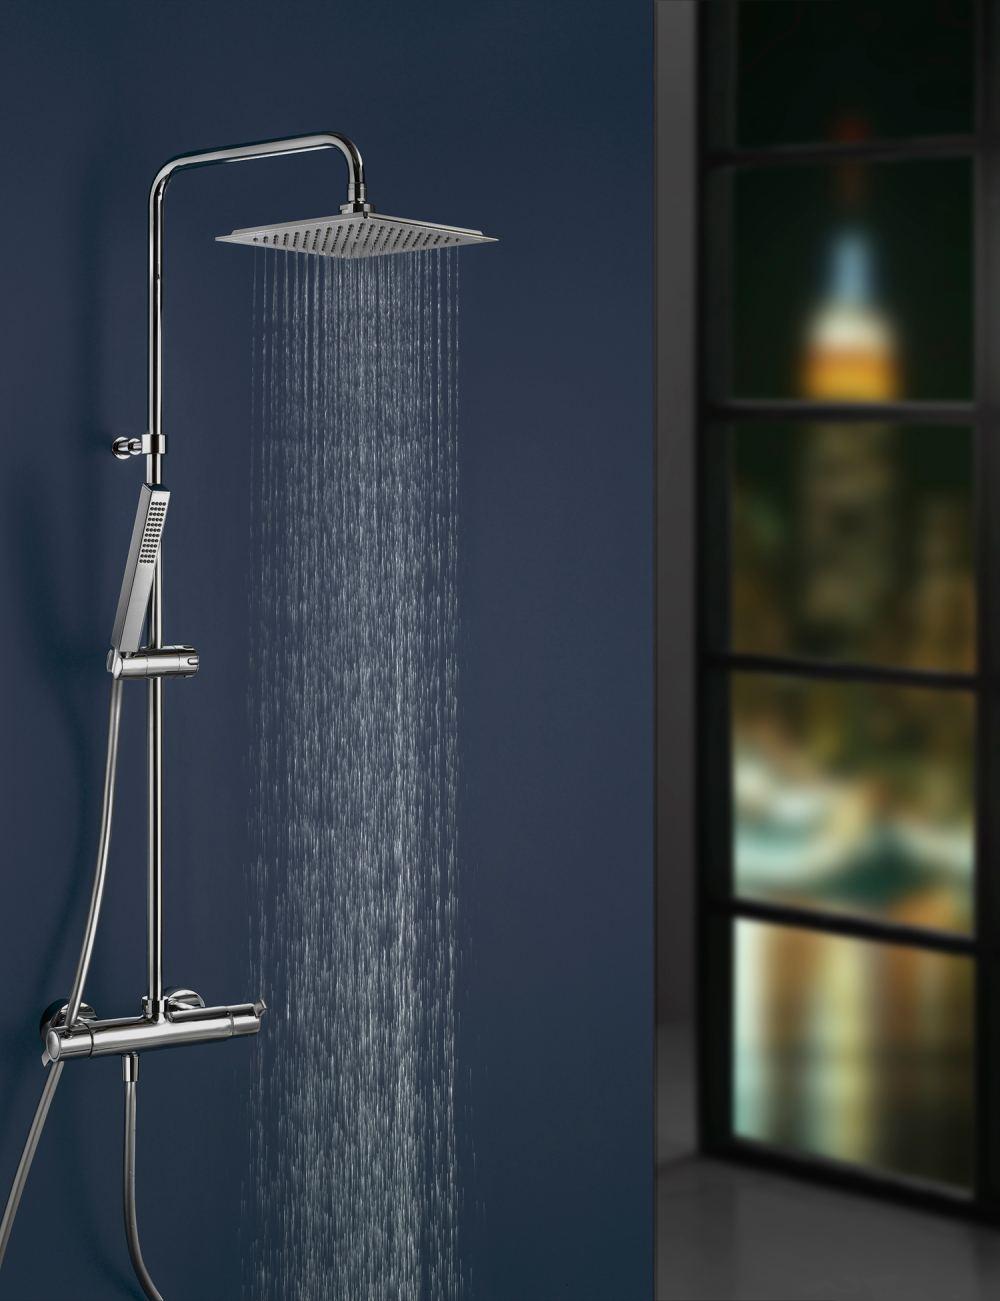 Ducha monomando con inversor integrado for Monomando para ducha